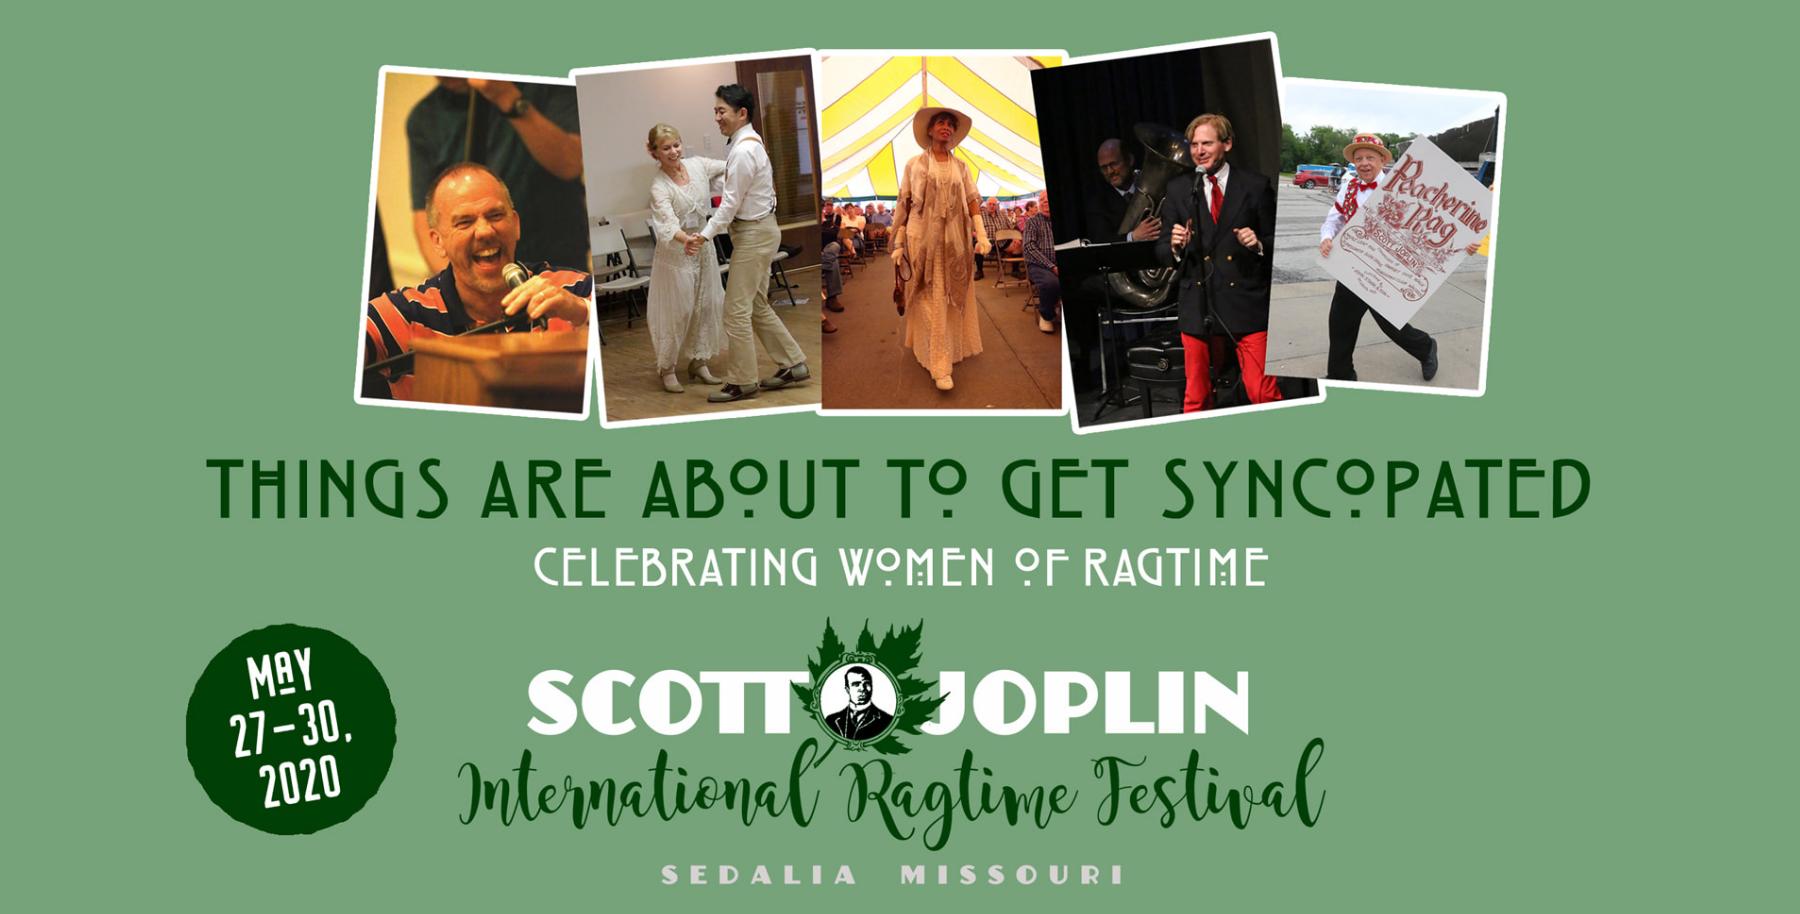 Scott Joplin International Ragtime Festival image